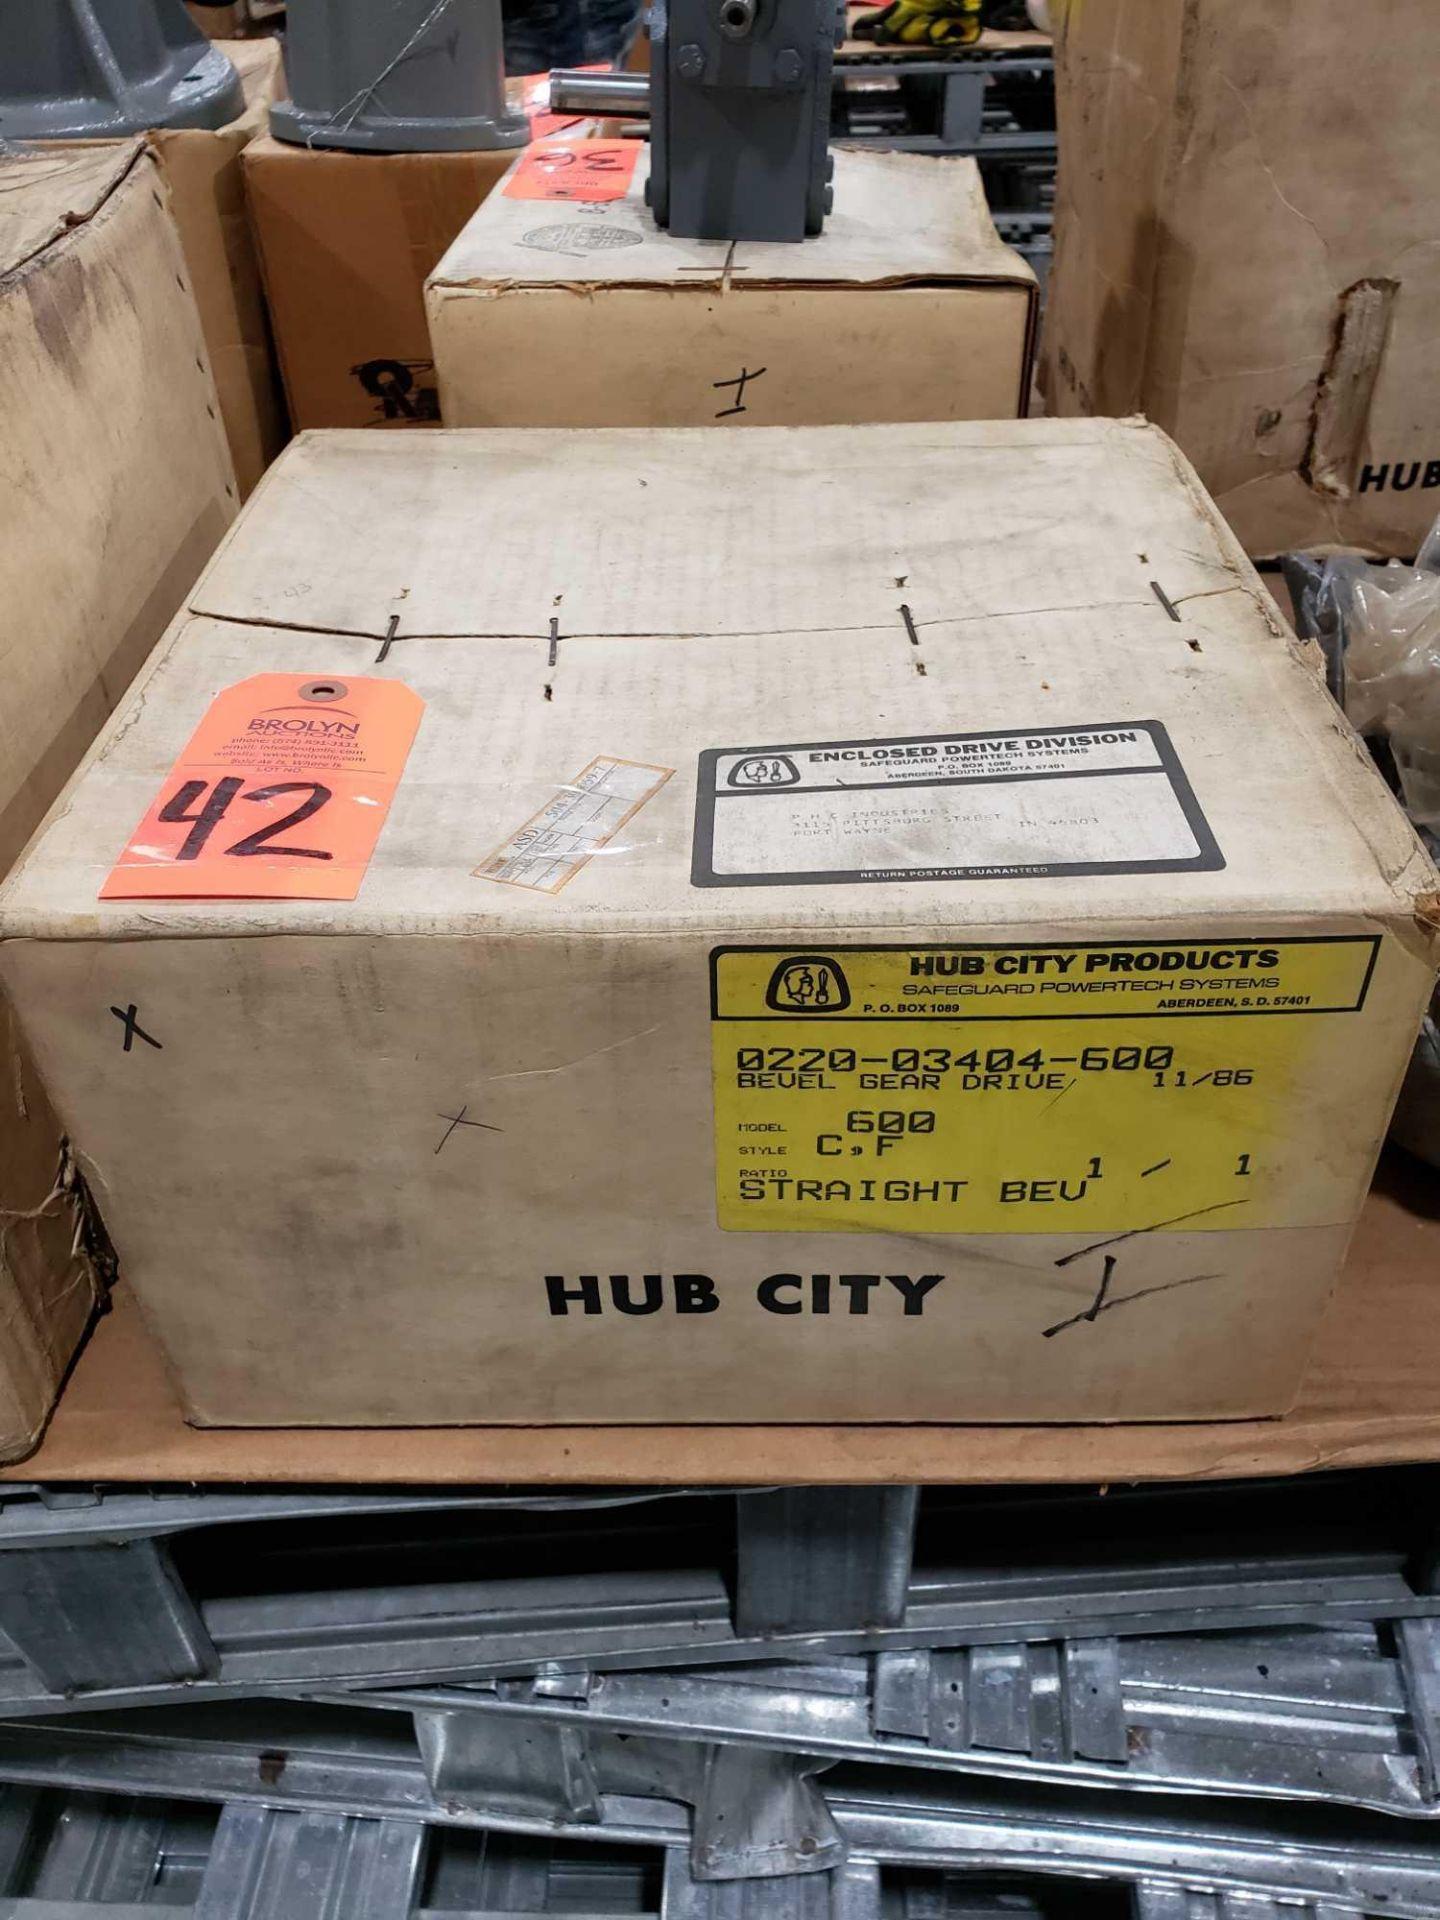 Lot 42 - Hub City model 0220-03404-600 bevel gear drive. Model 600 style C.F. 1:1 ratio.